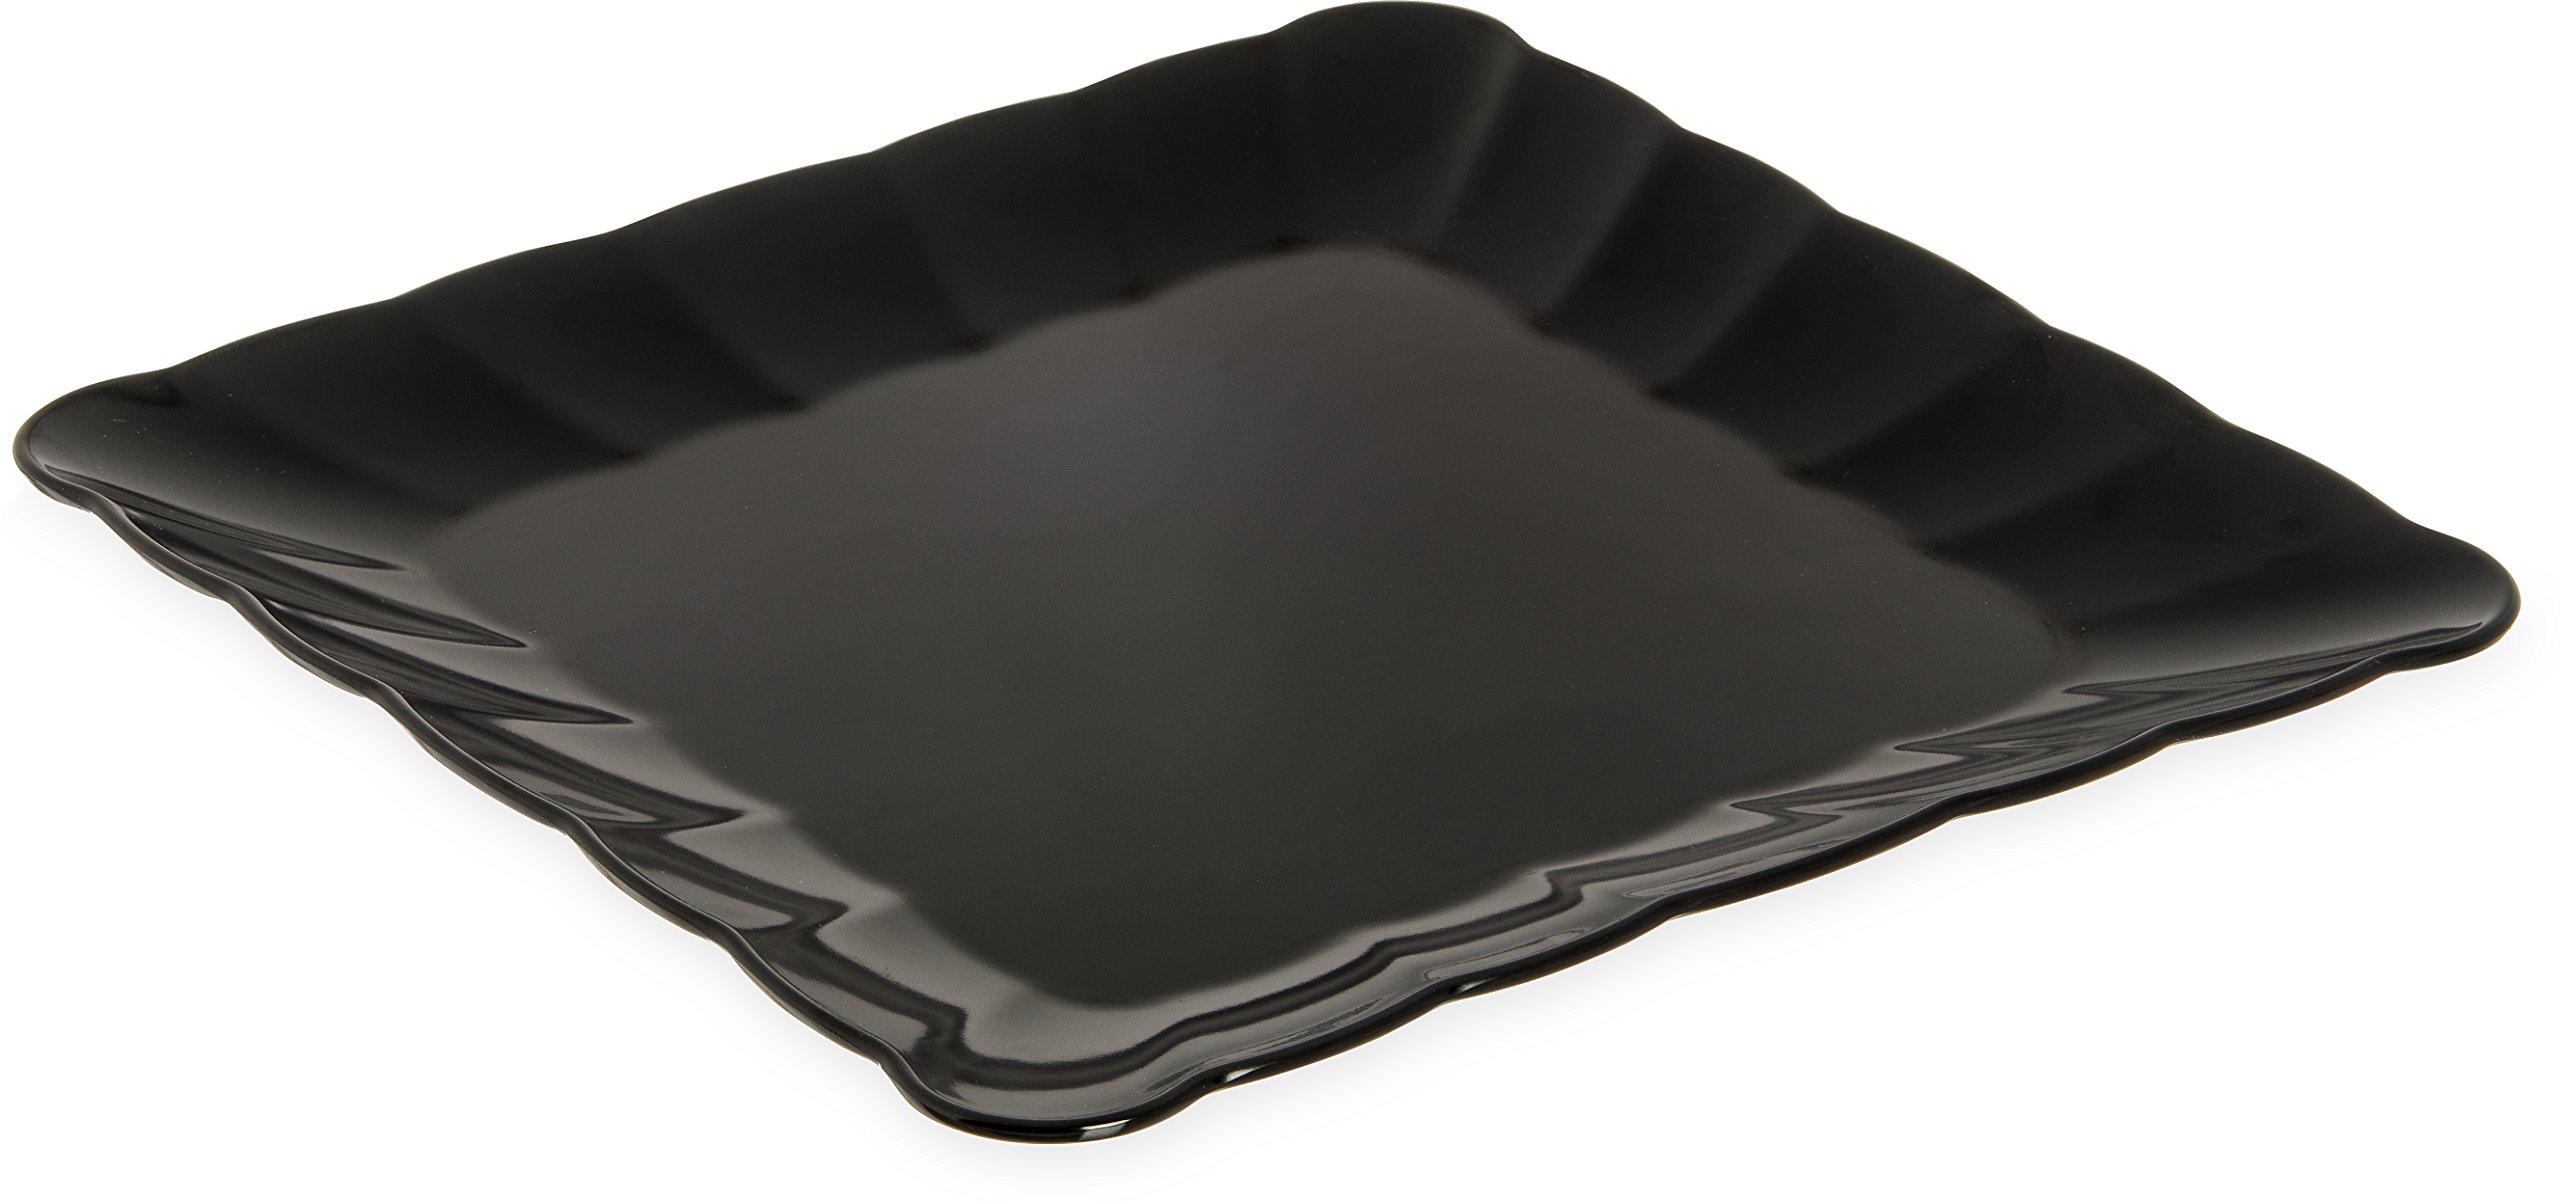 Carlisle 792403 Displayware Melamine Square Small Scalloped Platter, 1.25'' x 14.5'' x 14.5'', Black (Case of 4)